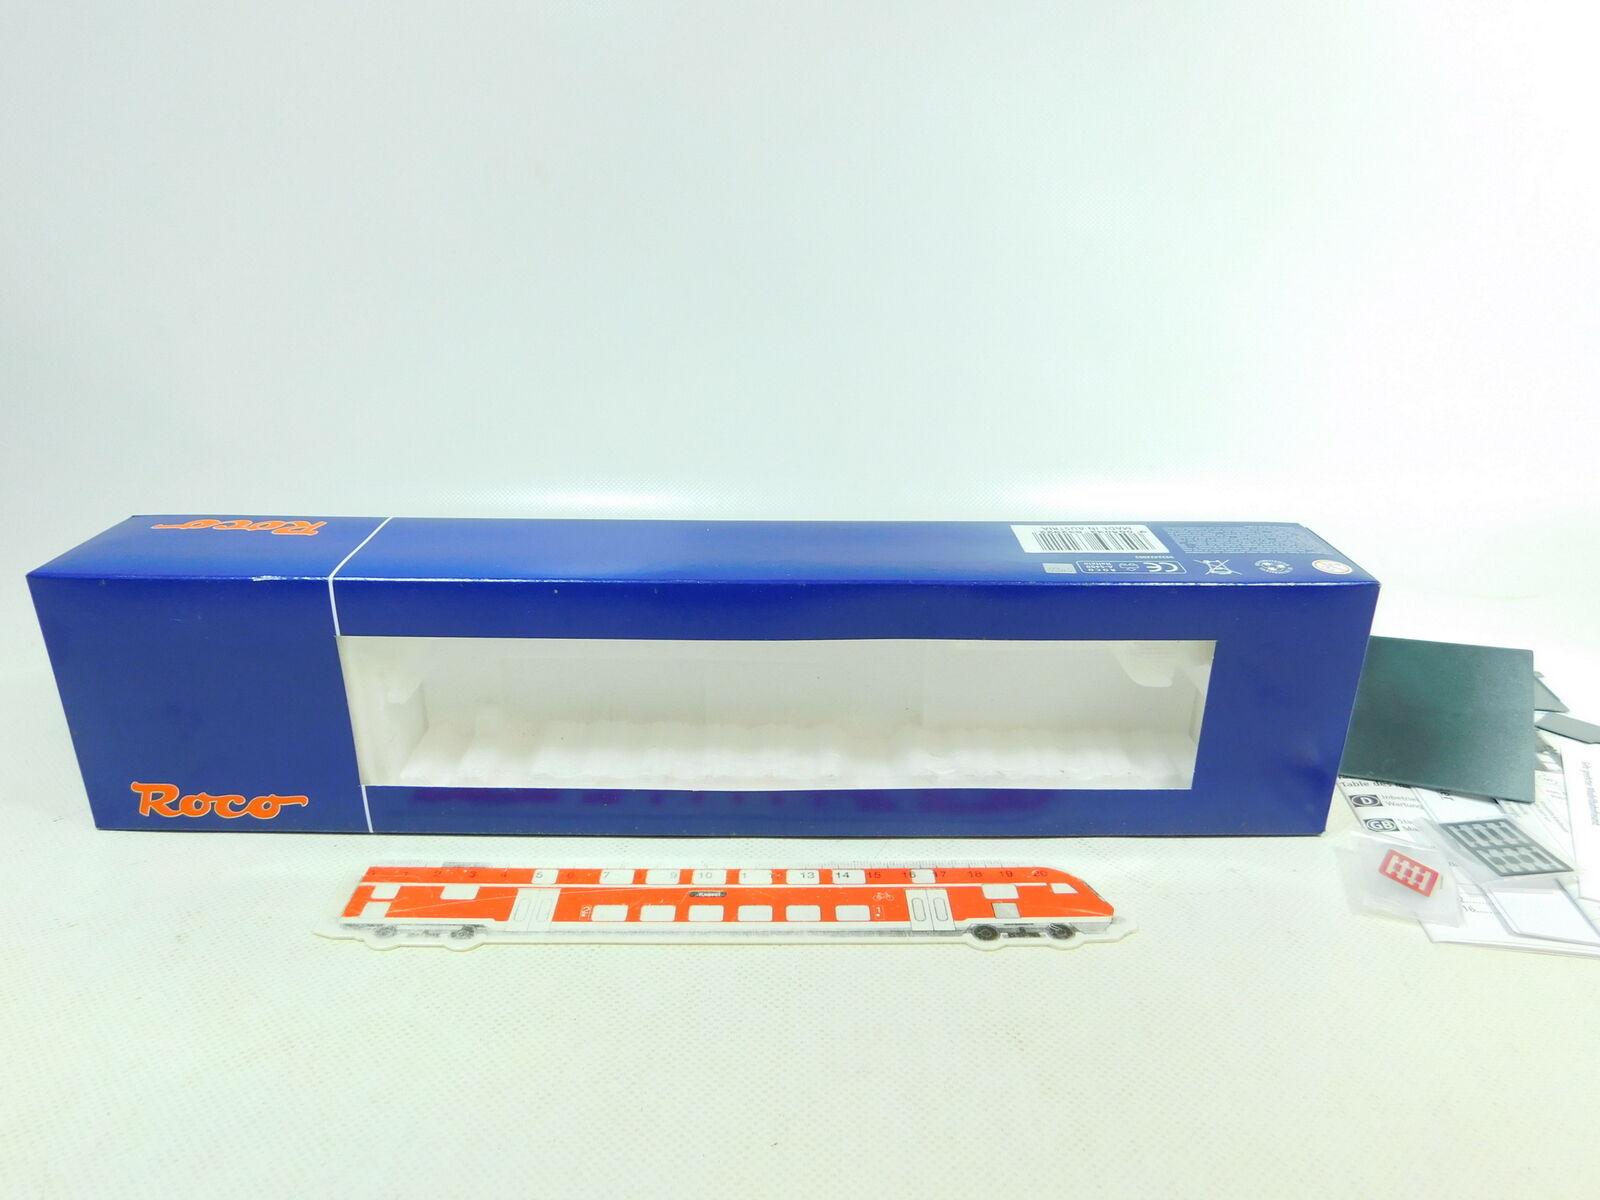 BT769-0, 5 Roco H0 Empty Box for 63292 Steam Locomotive 50 622 Db